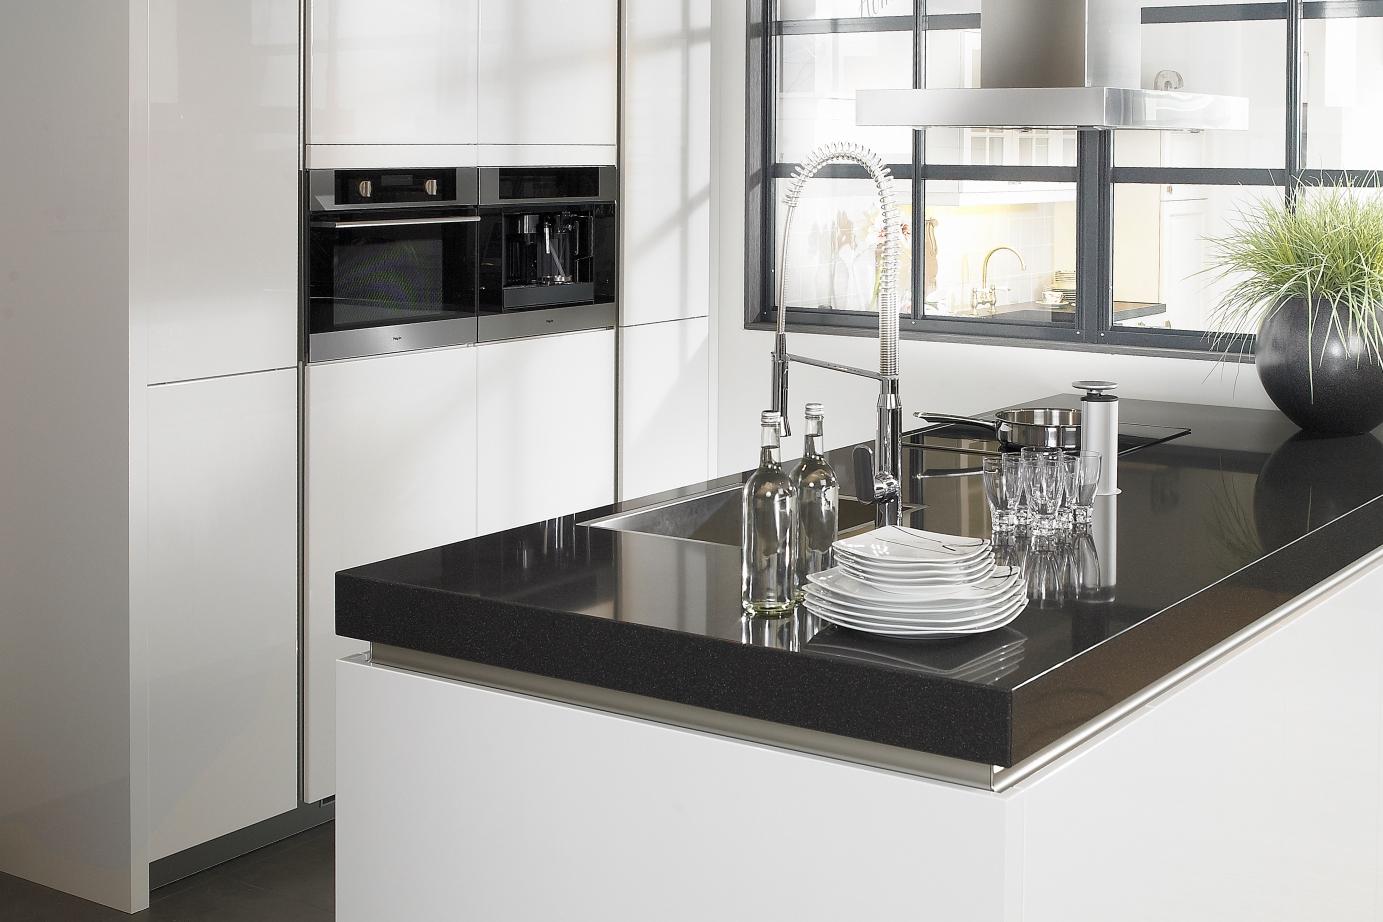 Keuken Greeploze : Greeploze keuken. Fris wit. – DB Keukens